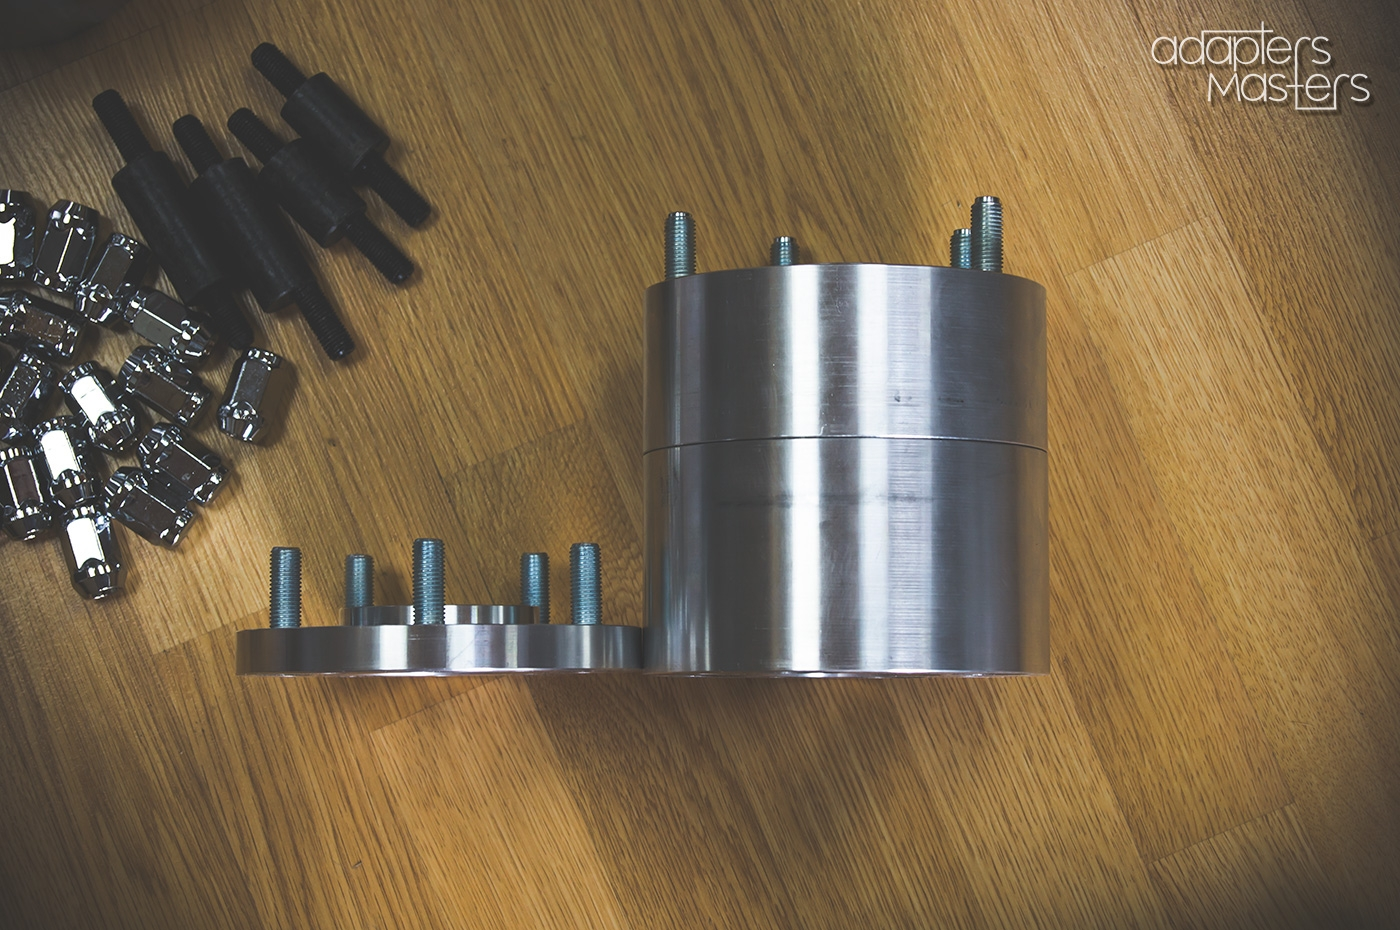 13. 4x108-5x120; 2x120, 2x140 (6). Adapters Masters. Колесные проставки и адаптеры